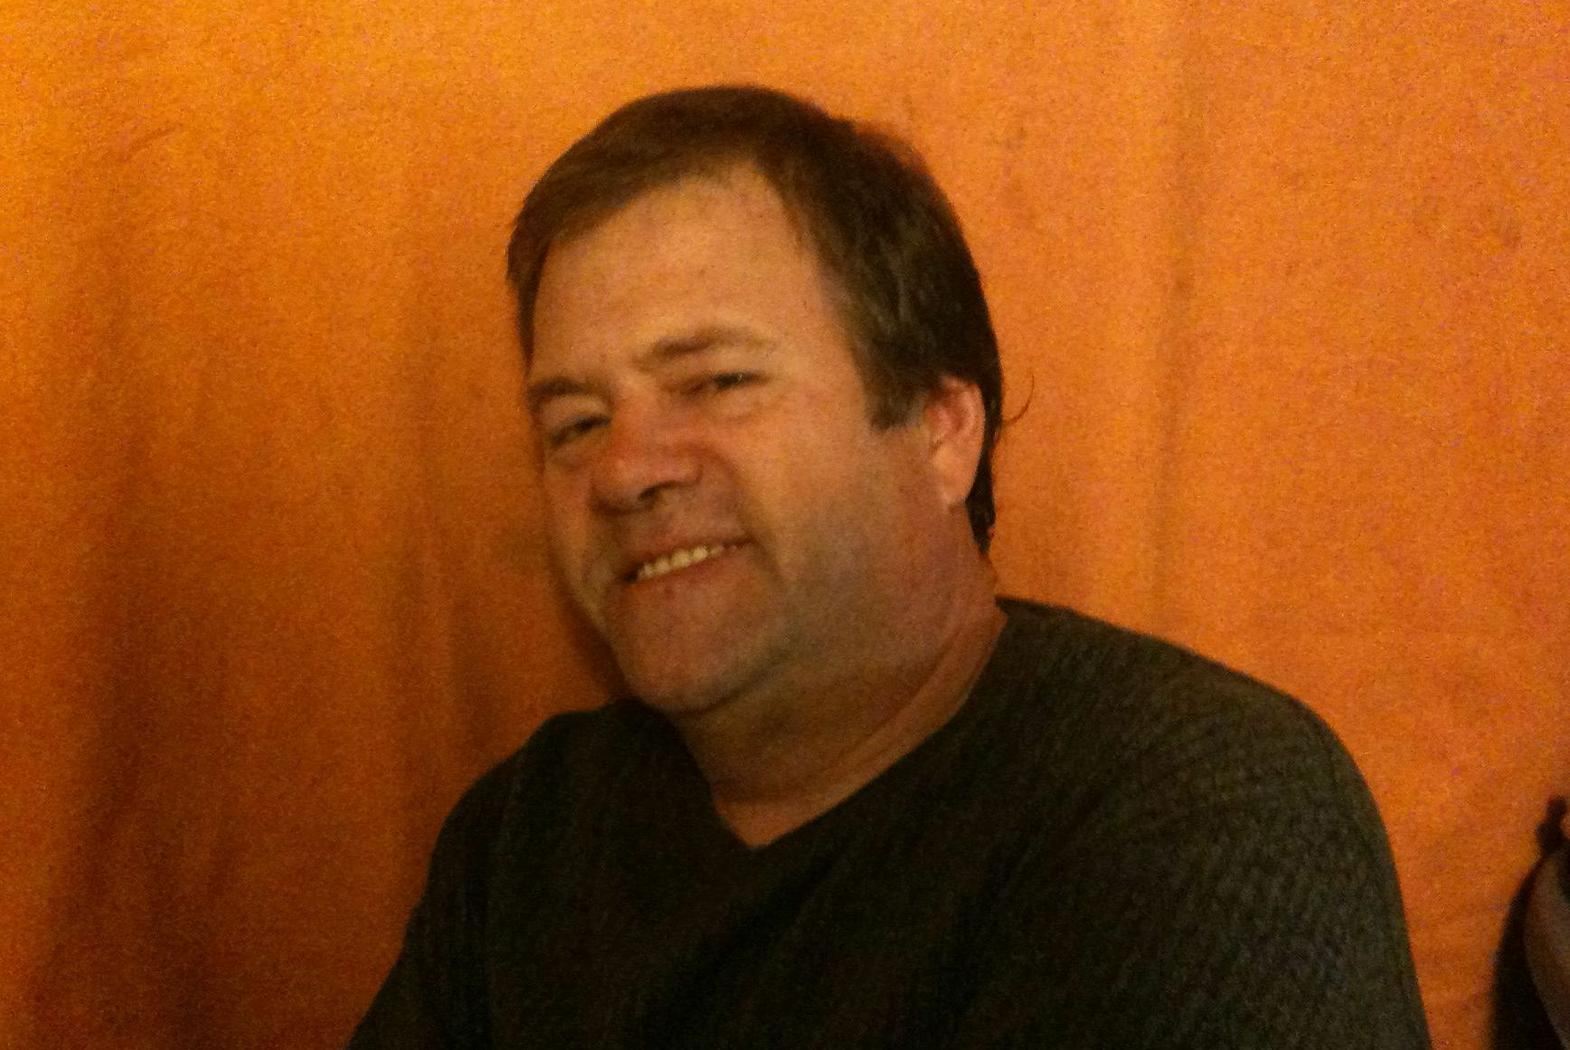 C. Jeff Oakes